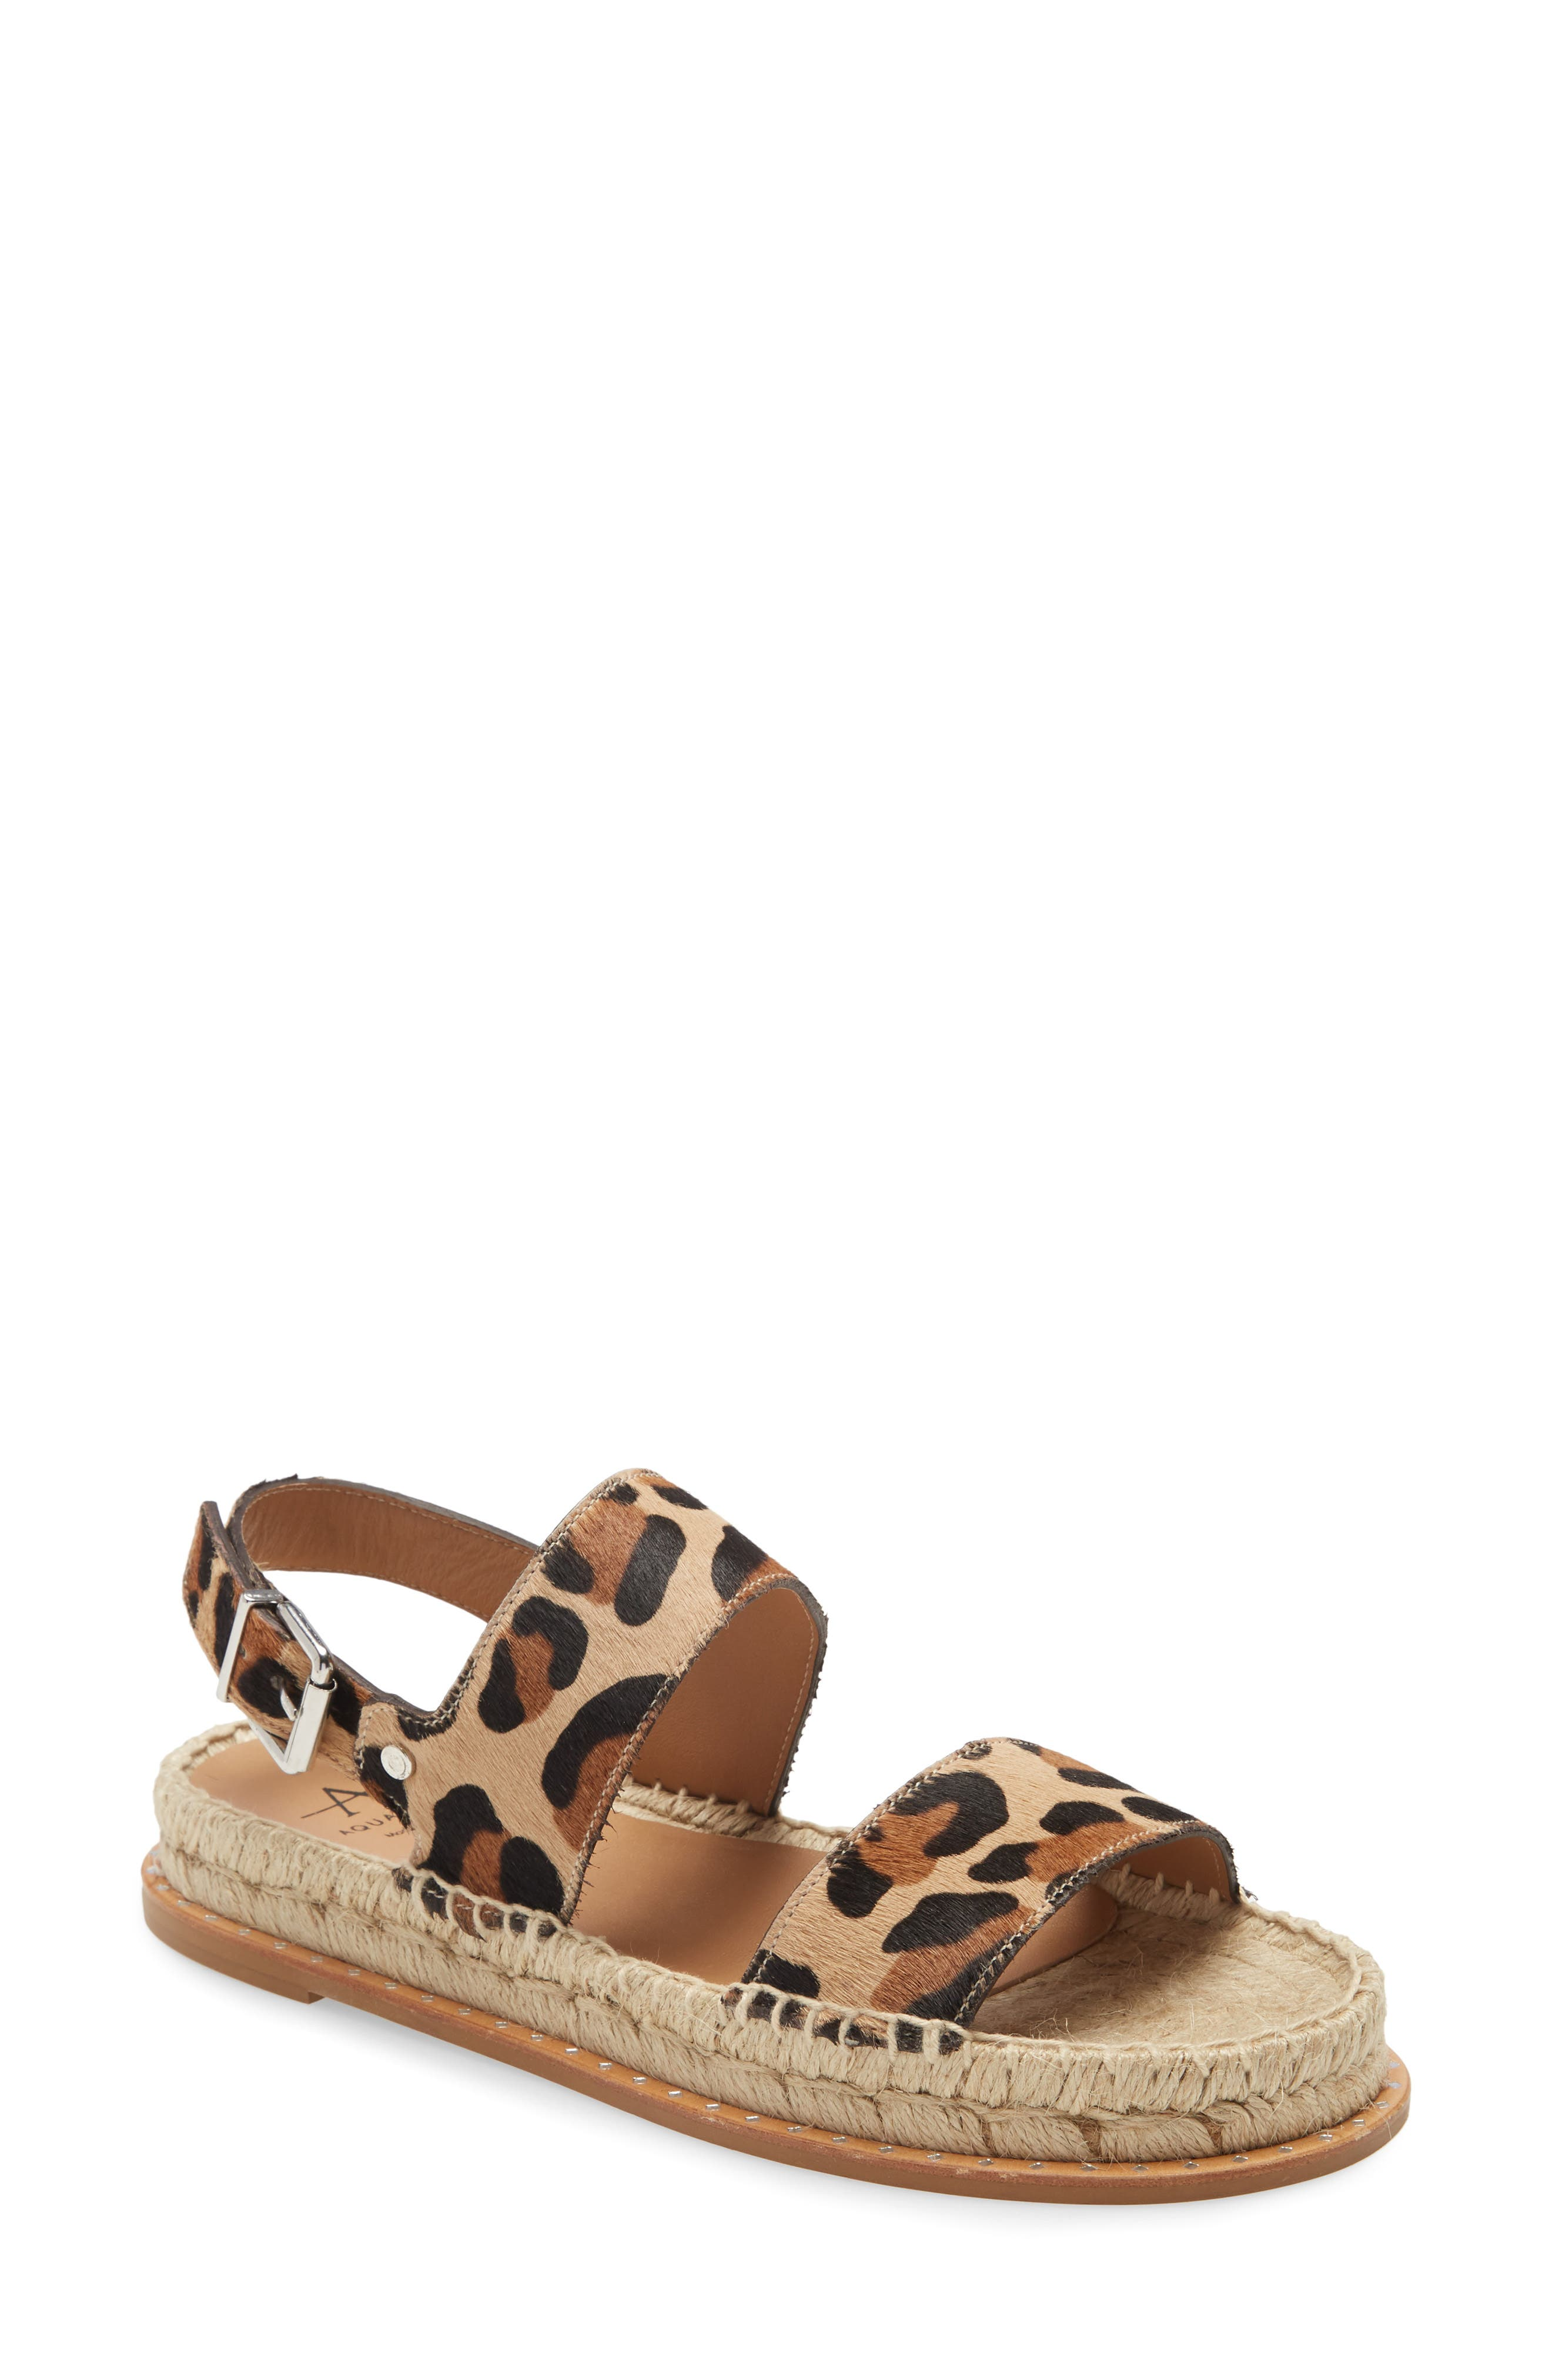 Image of Aquatalia Kira Genuine Calf Hair Leopard Print Espadrille Platform Sandal